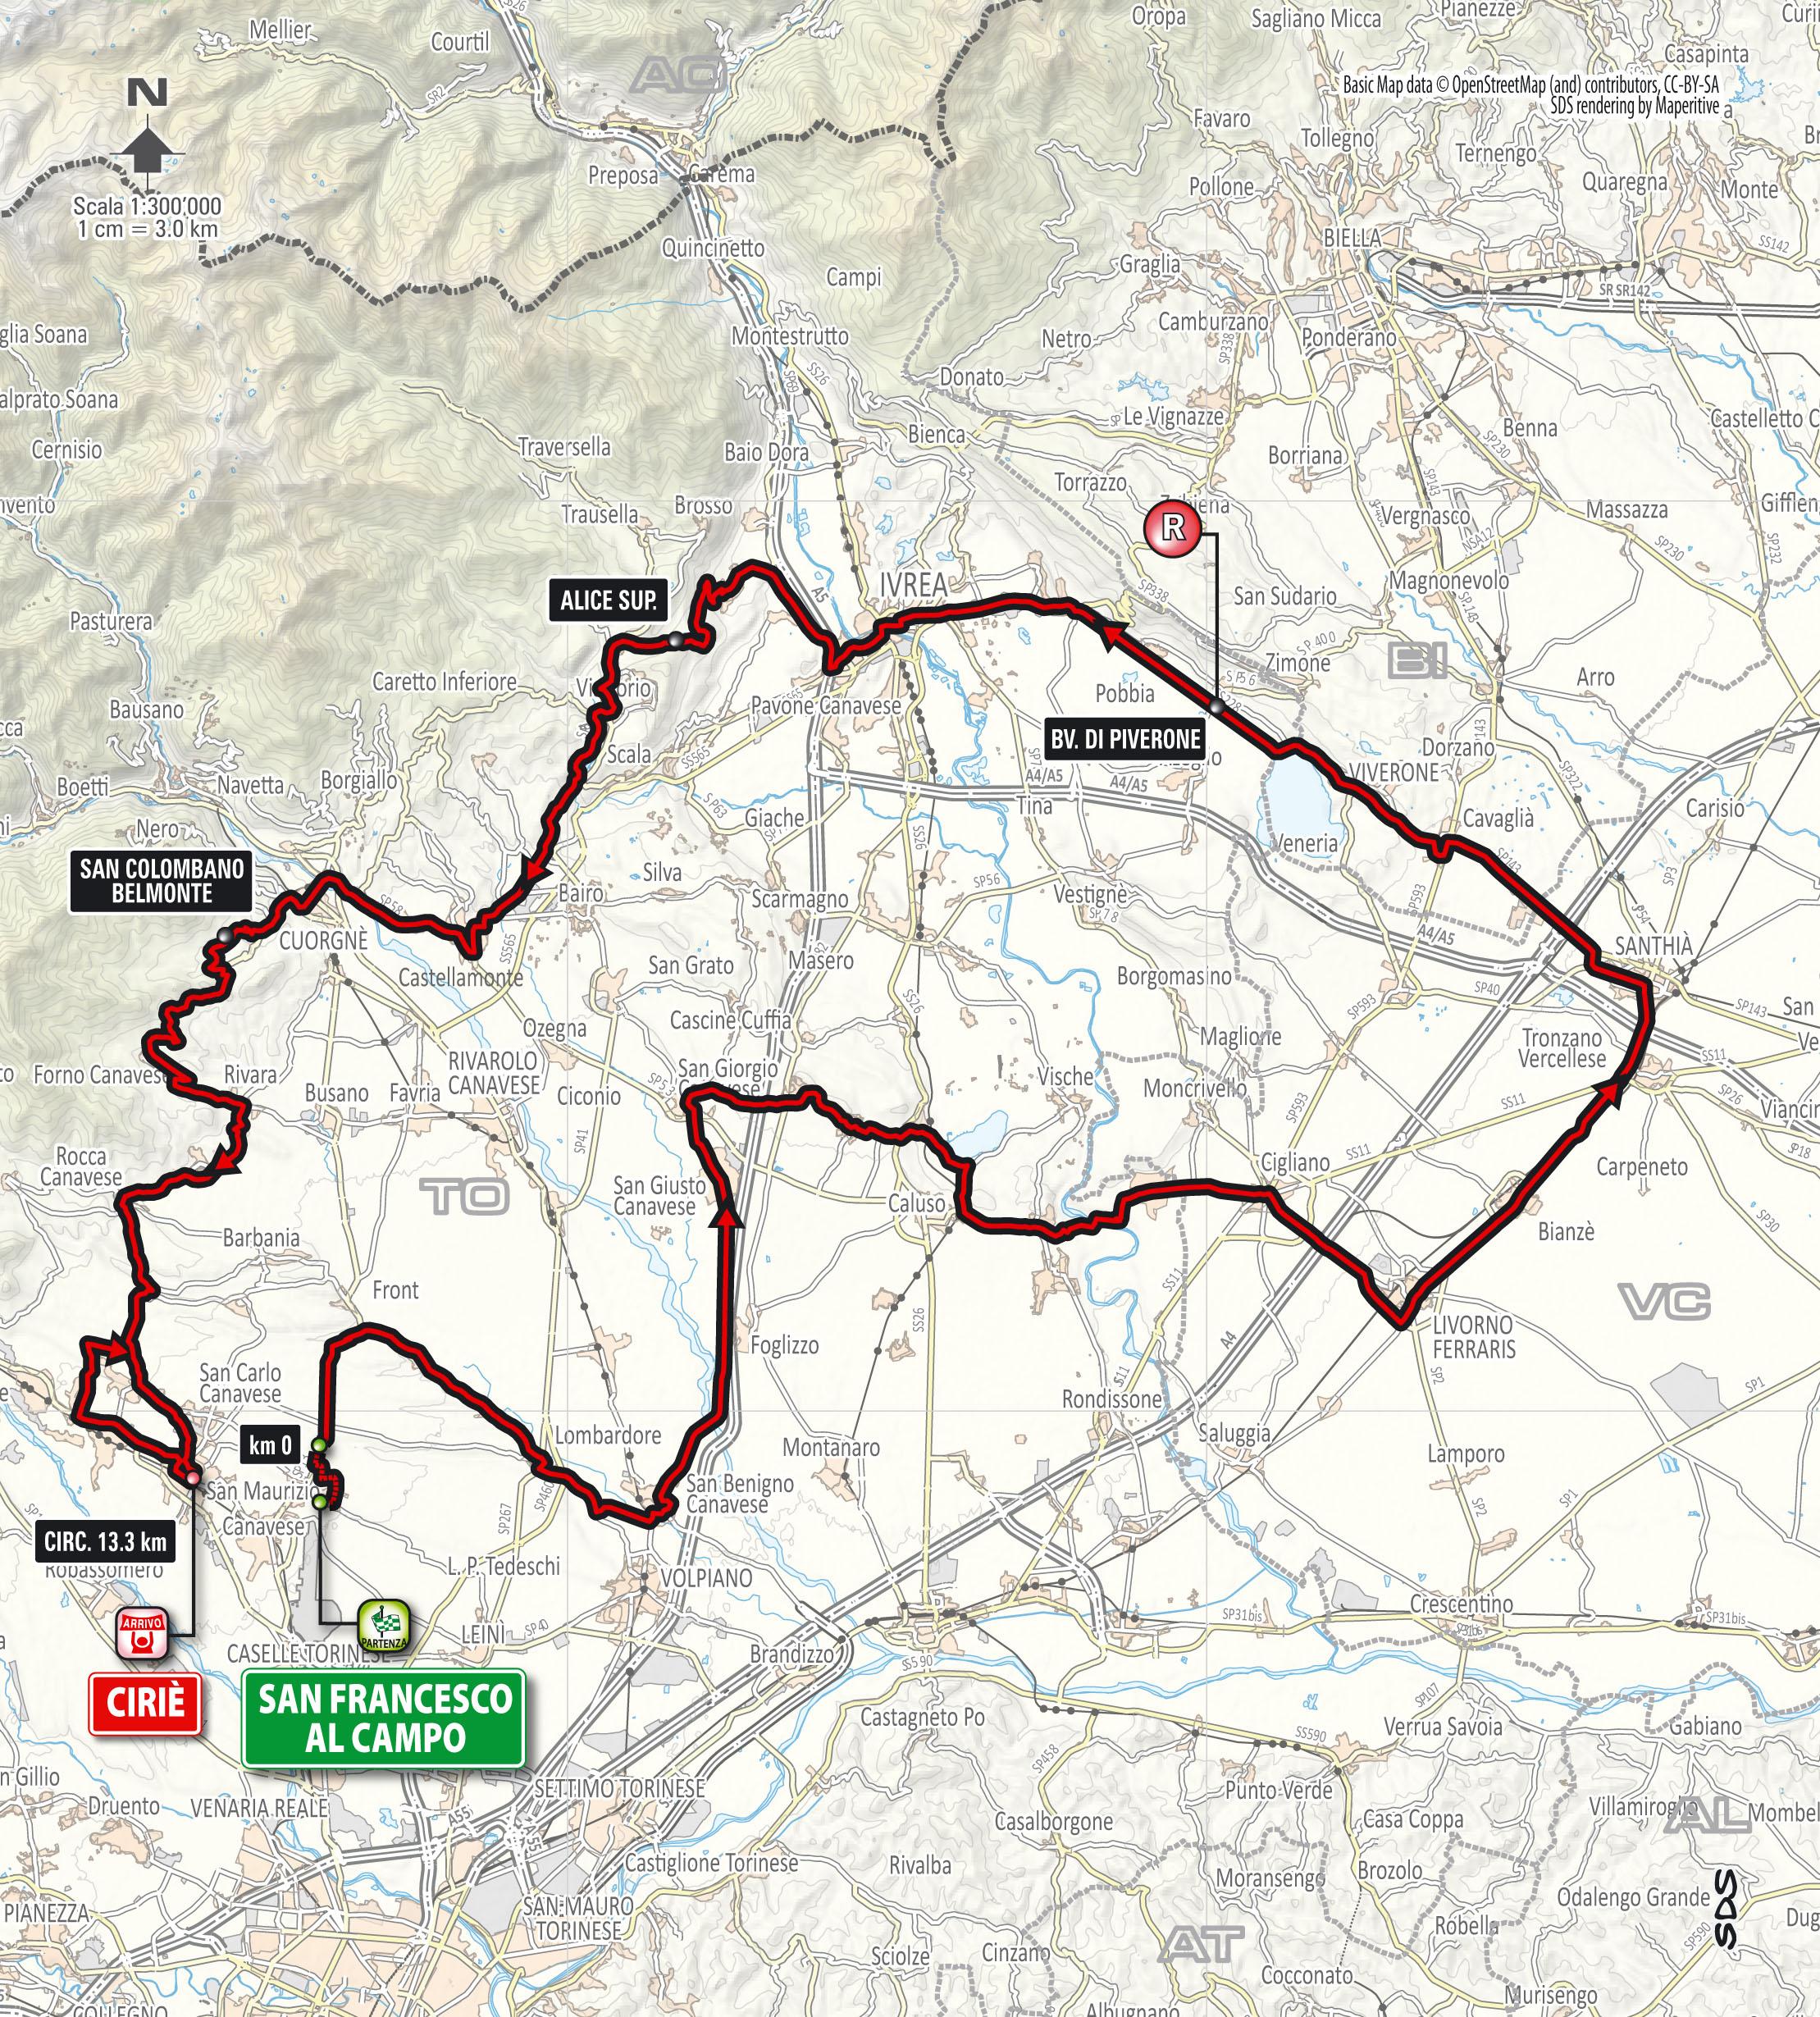 Parcours Giro del Piemonte 2015